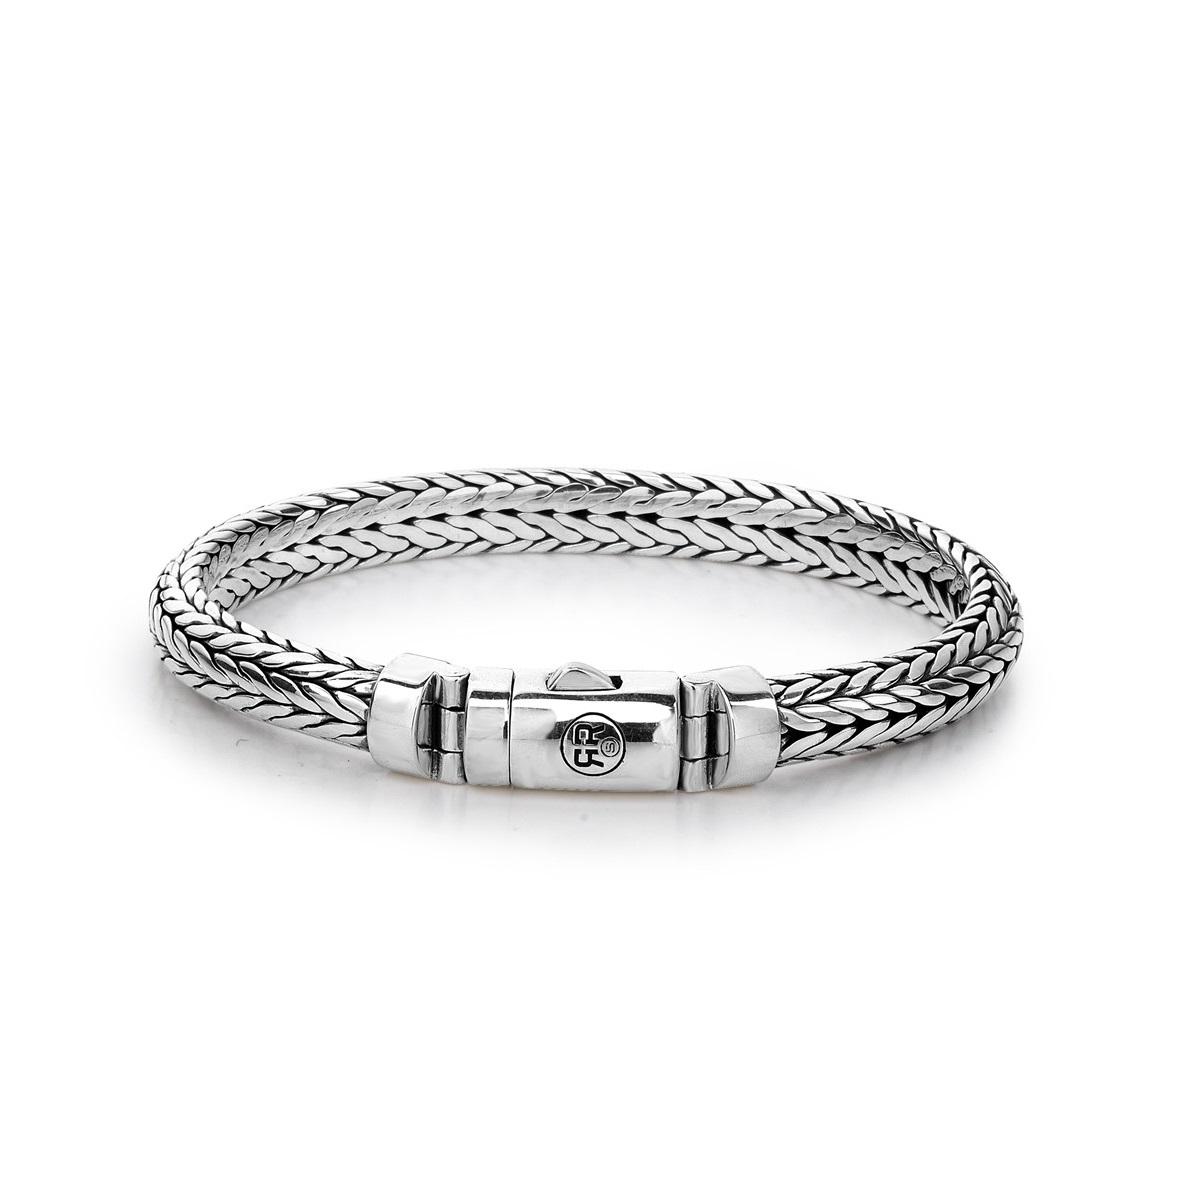 Rebel & Rose IRIS Silver Bracelet L